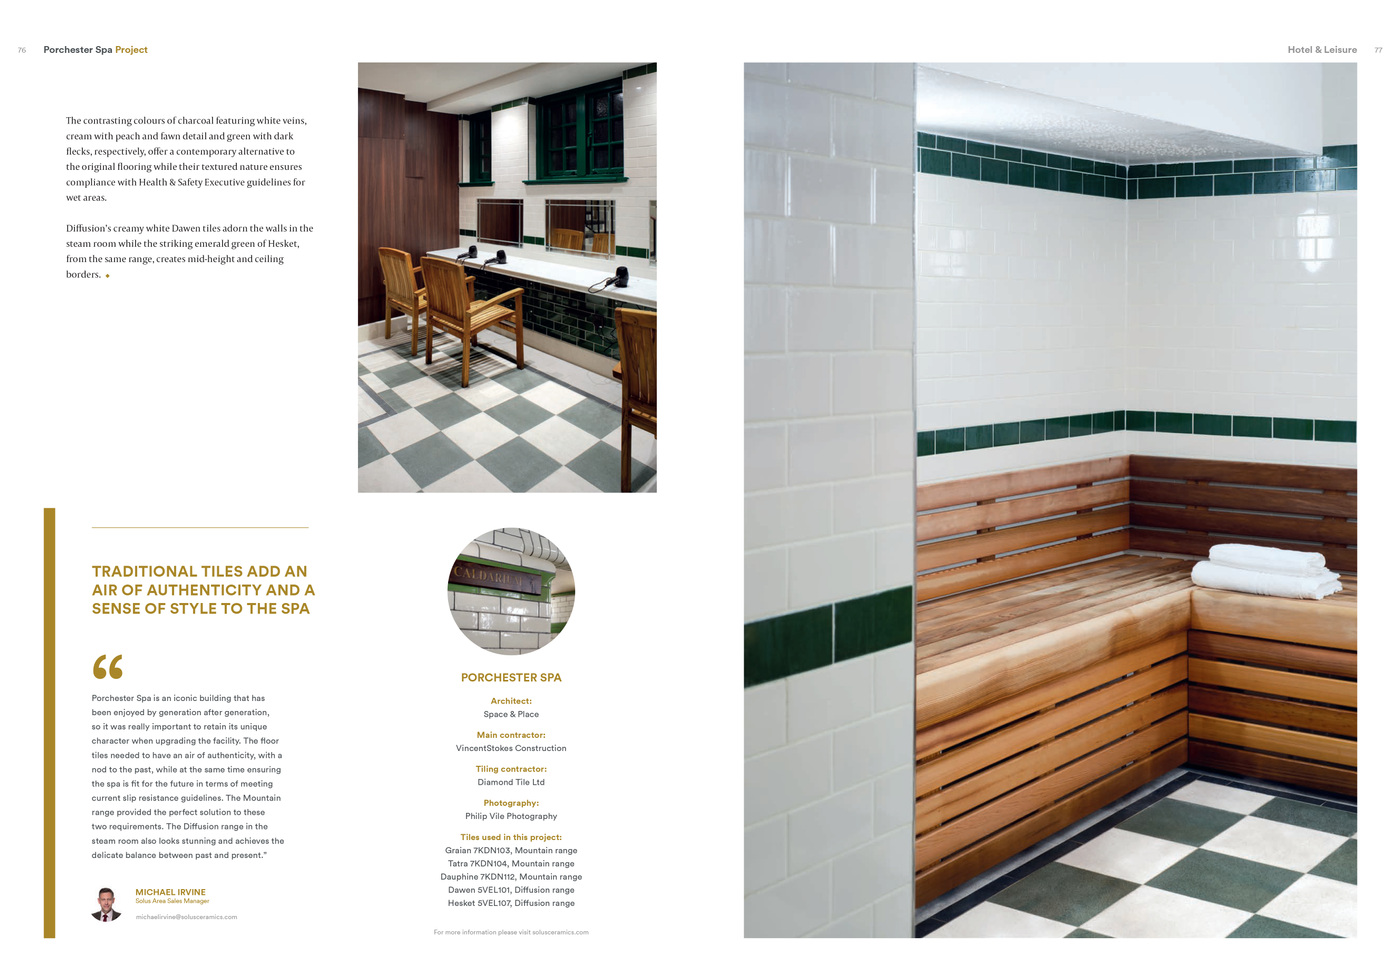 Lara-Jane van Antwerpen - Quarter Magazine Issue 20 - Porchester Spa Article